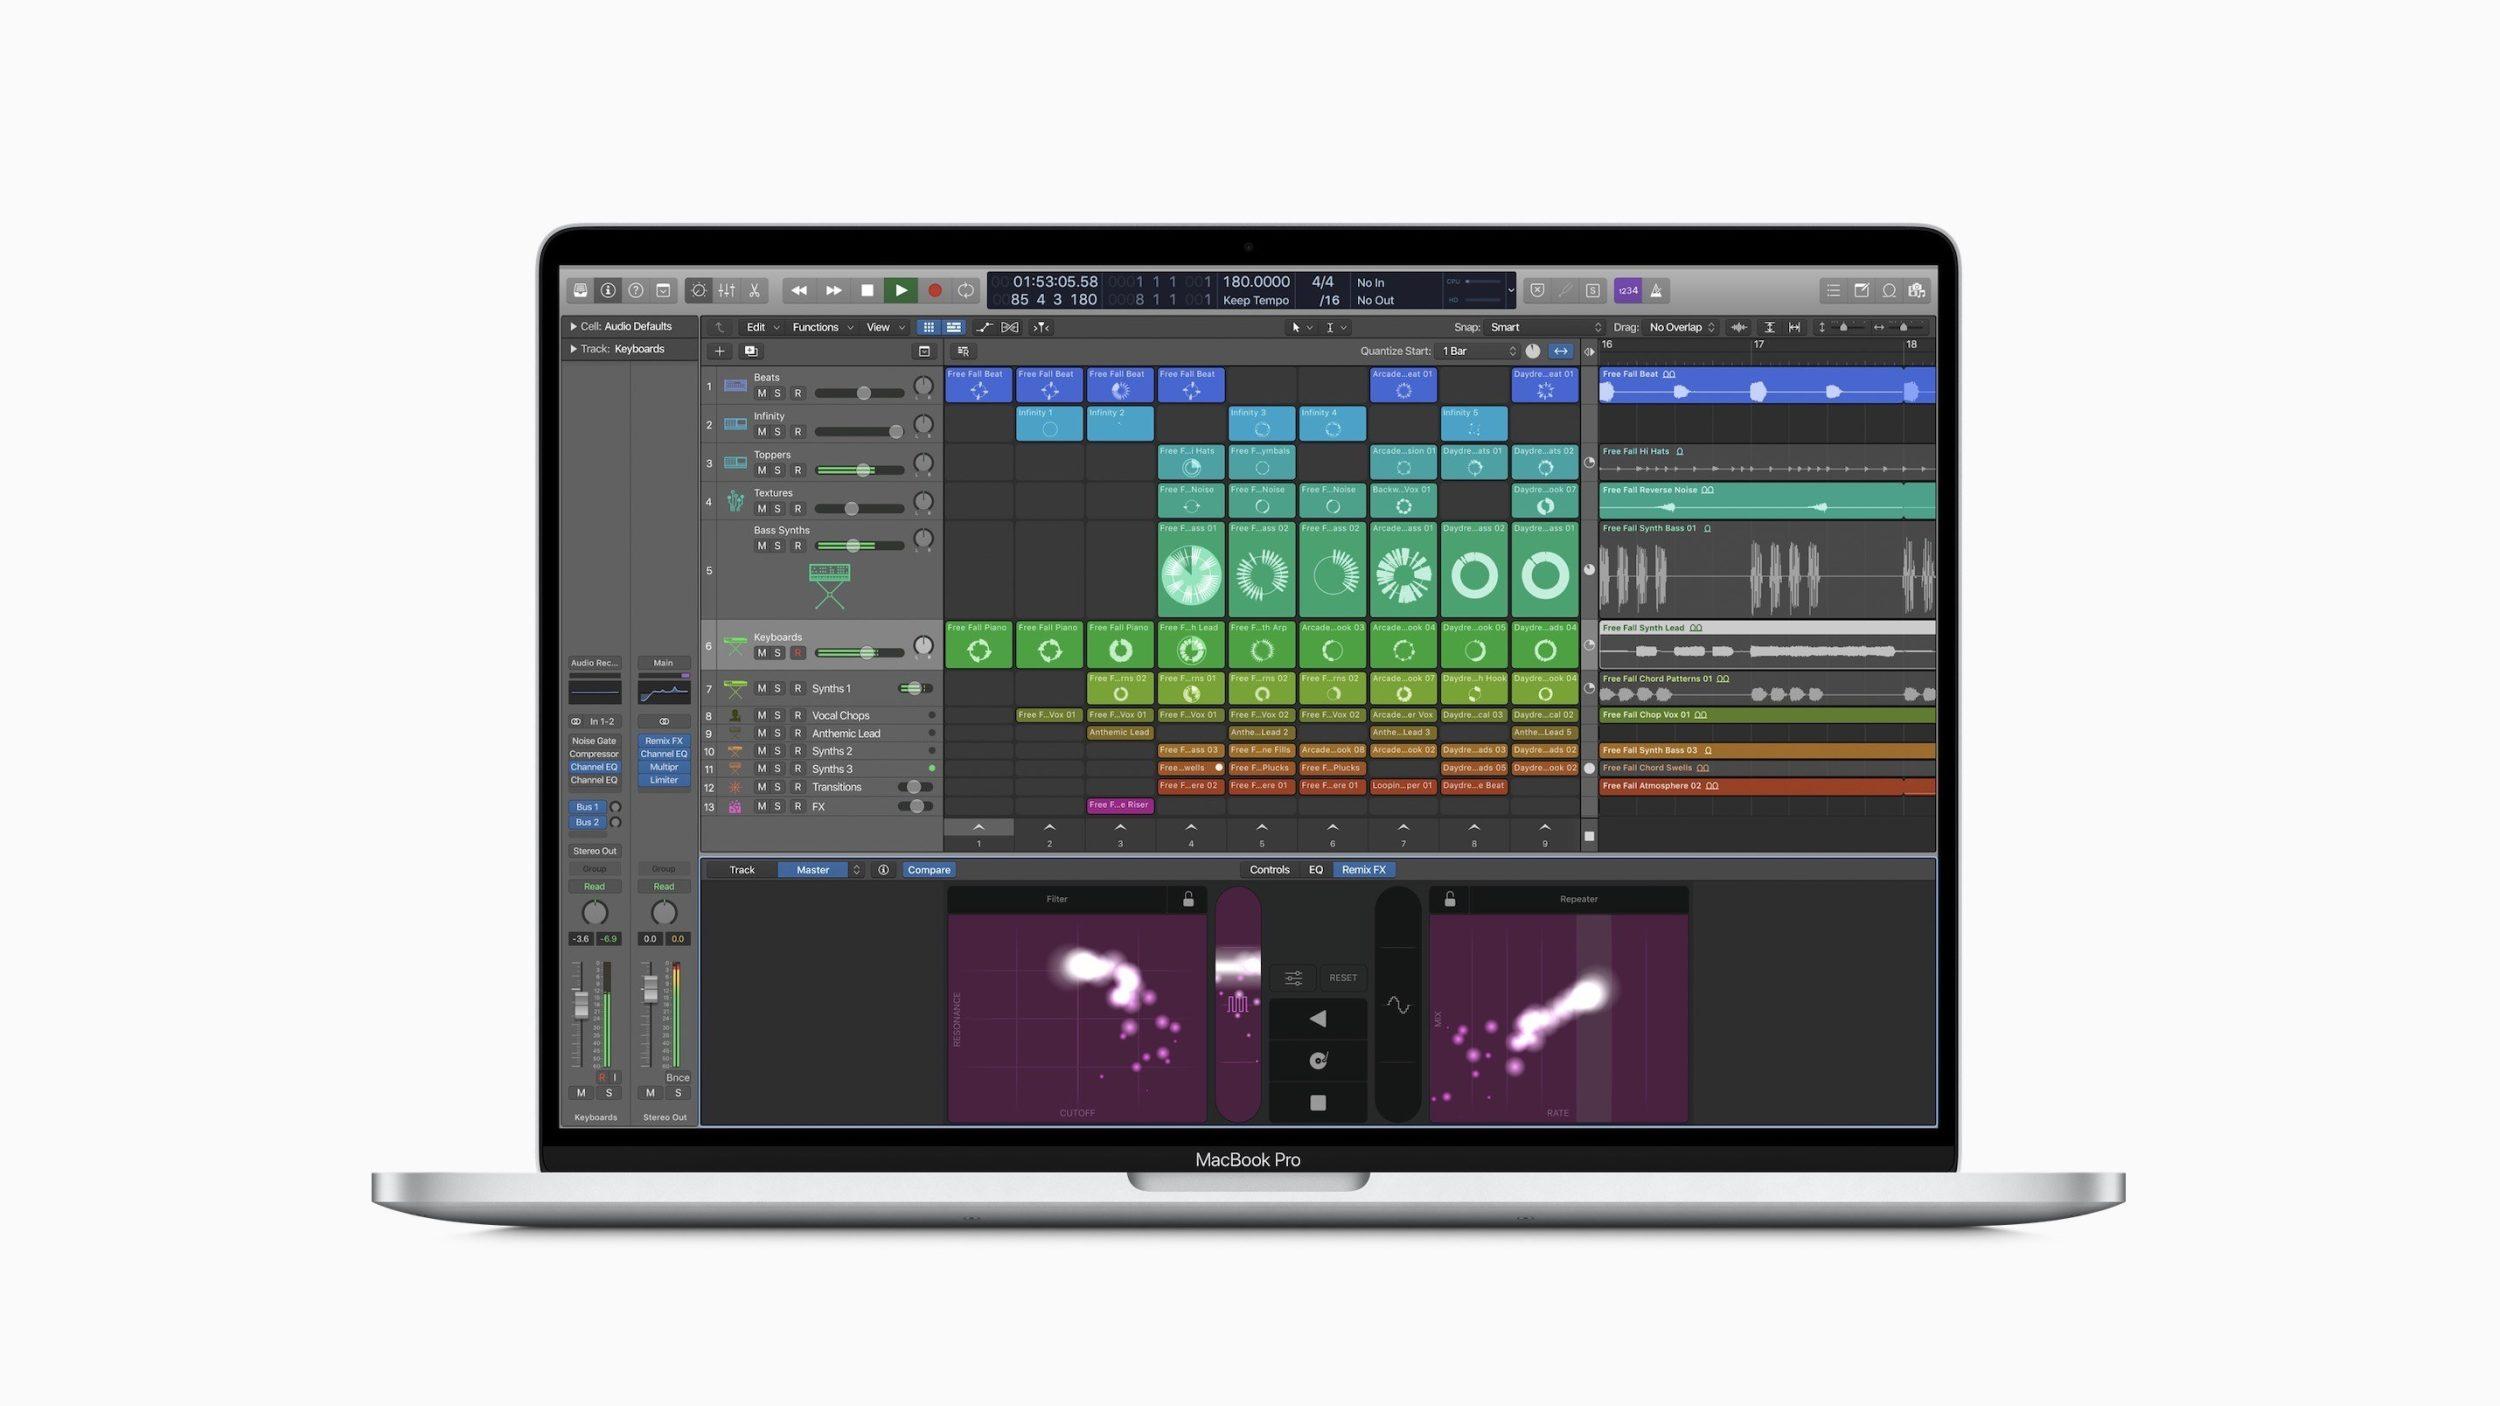 MacBook Pro with Logic Pro X